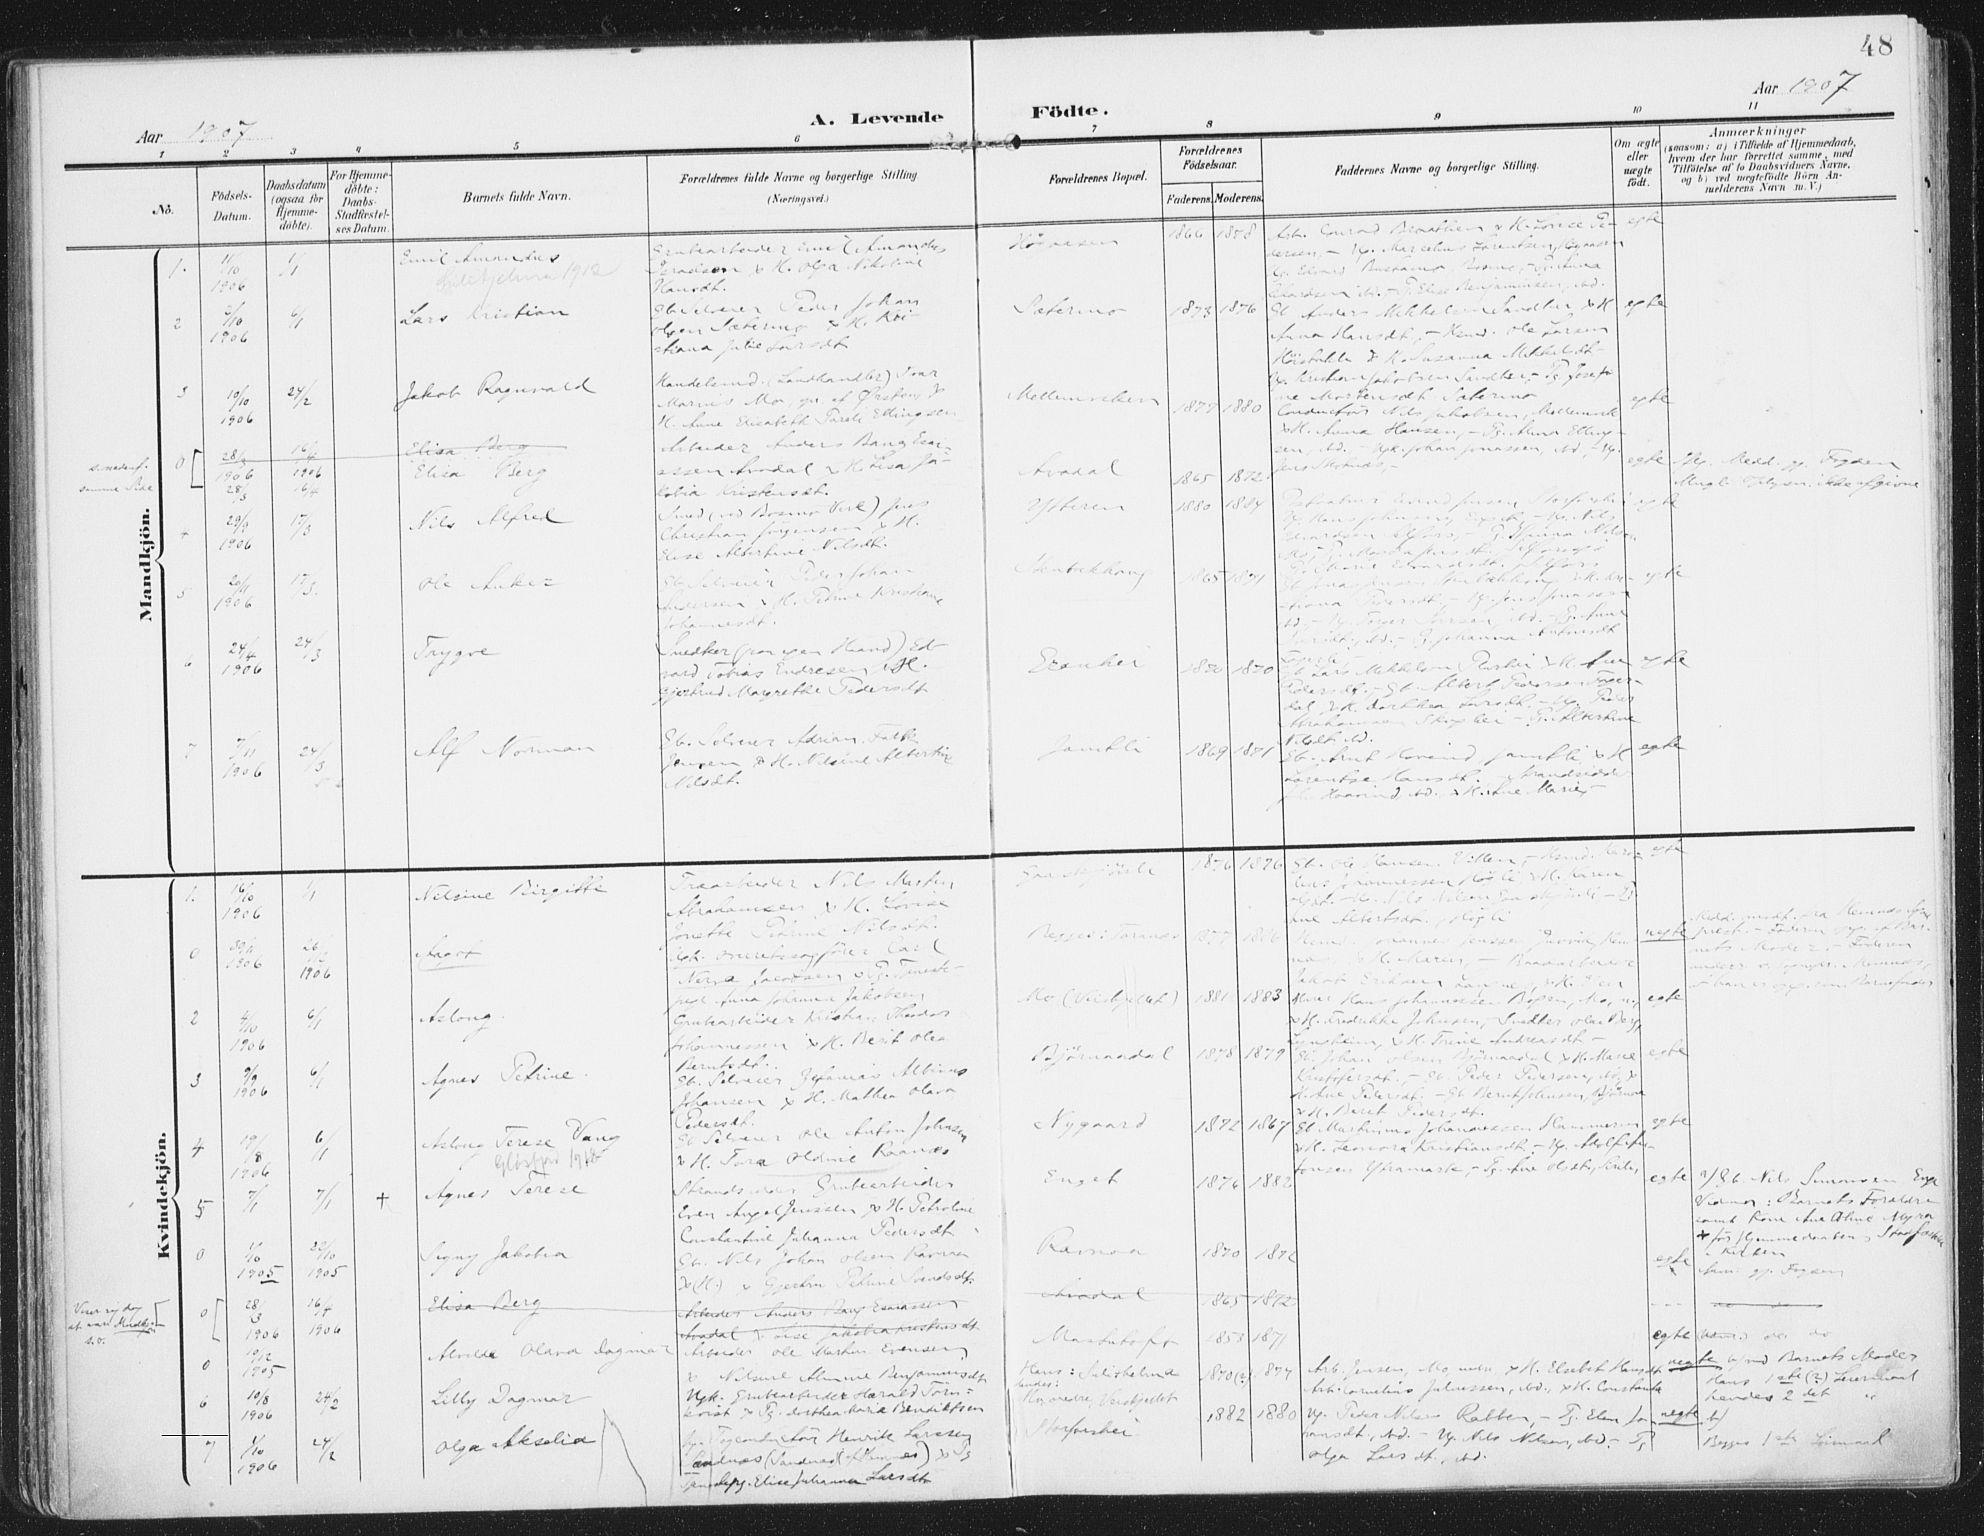 SAT, Ministerialprotokoller, klokkerbøker og fødselsregistre - Nordland, 827/L0402: Ministerialbok nr. 827A14, 1903-1912, s. 48